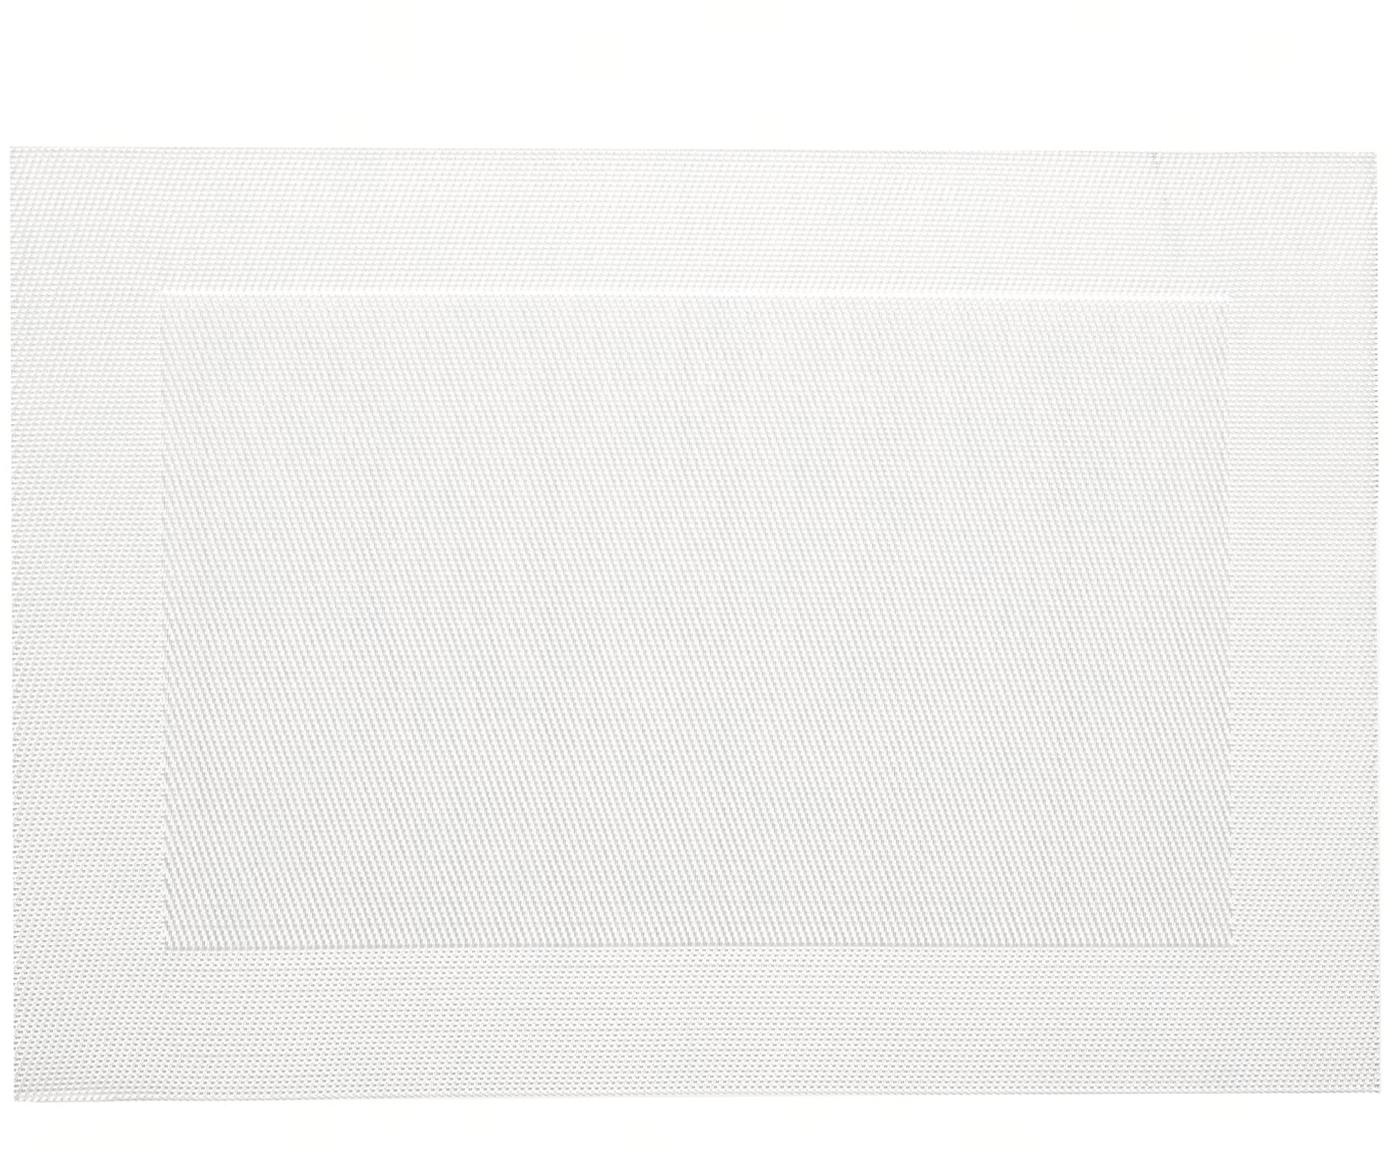 Tovaglietta americana Modern 2 pz, Materiale sintetico, Madreperla, Larg. 33 x Lung. 46 cm